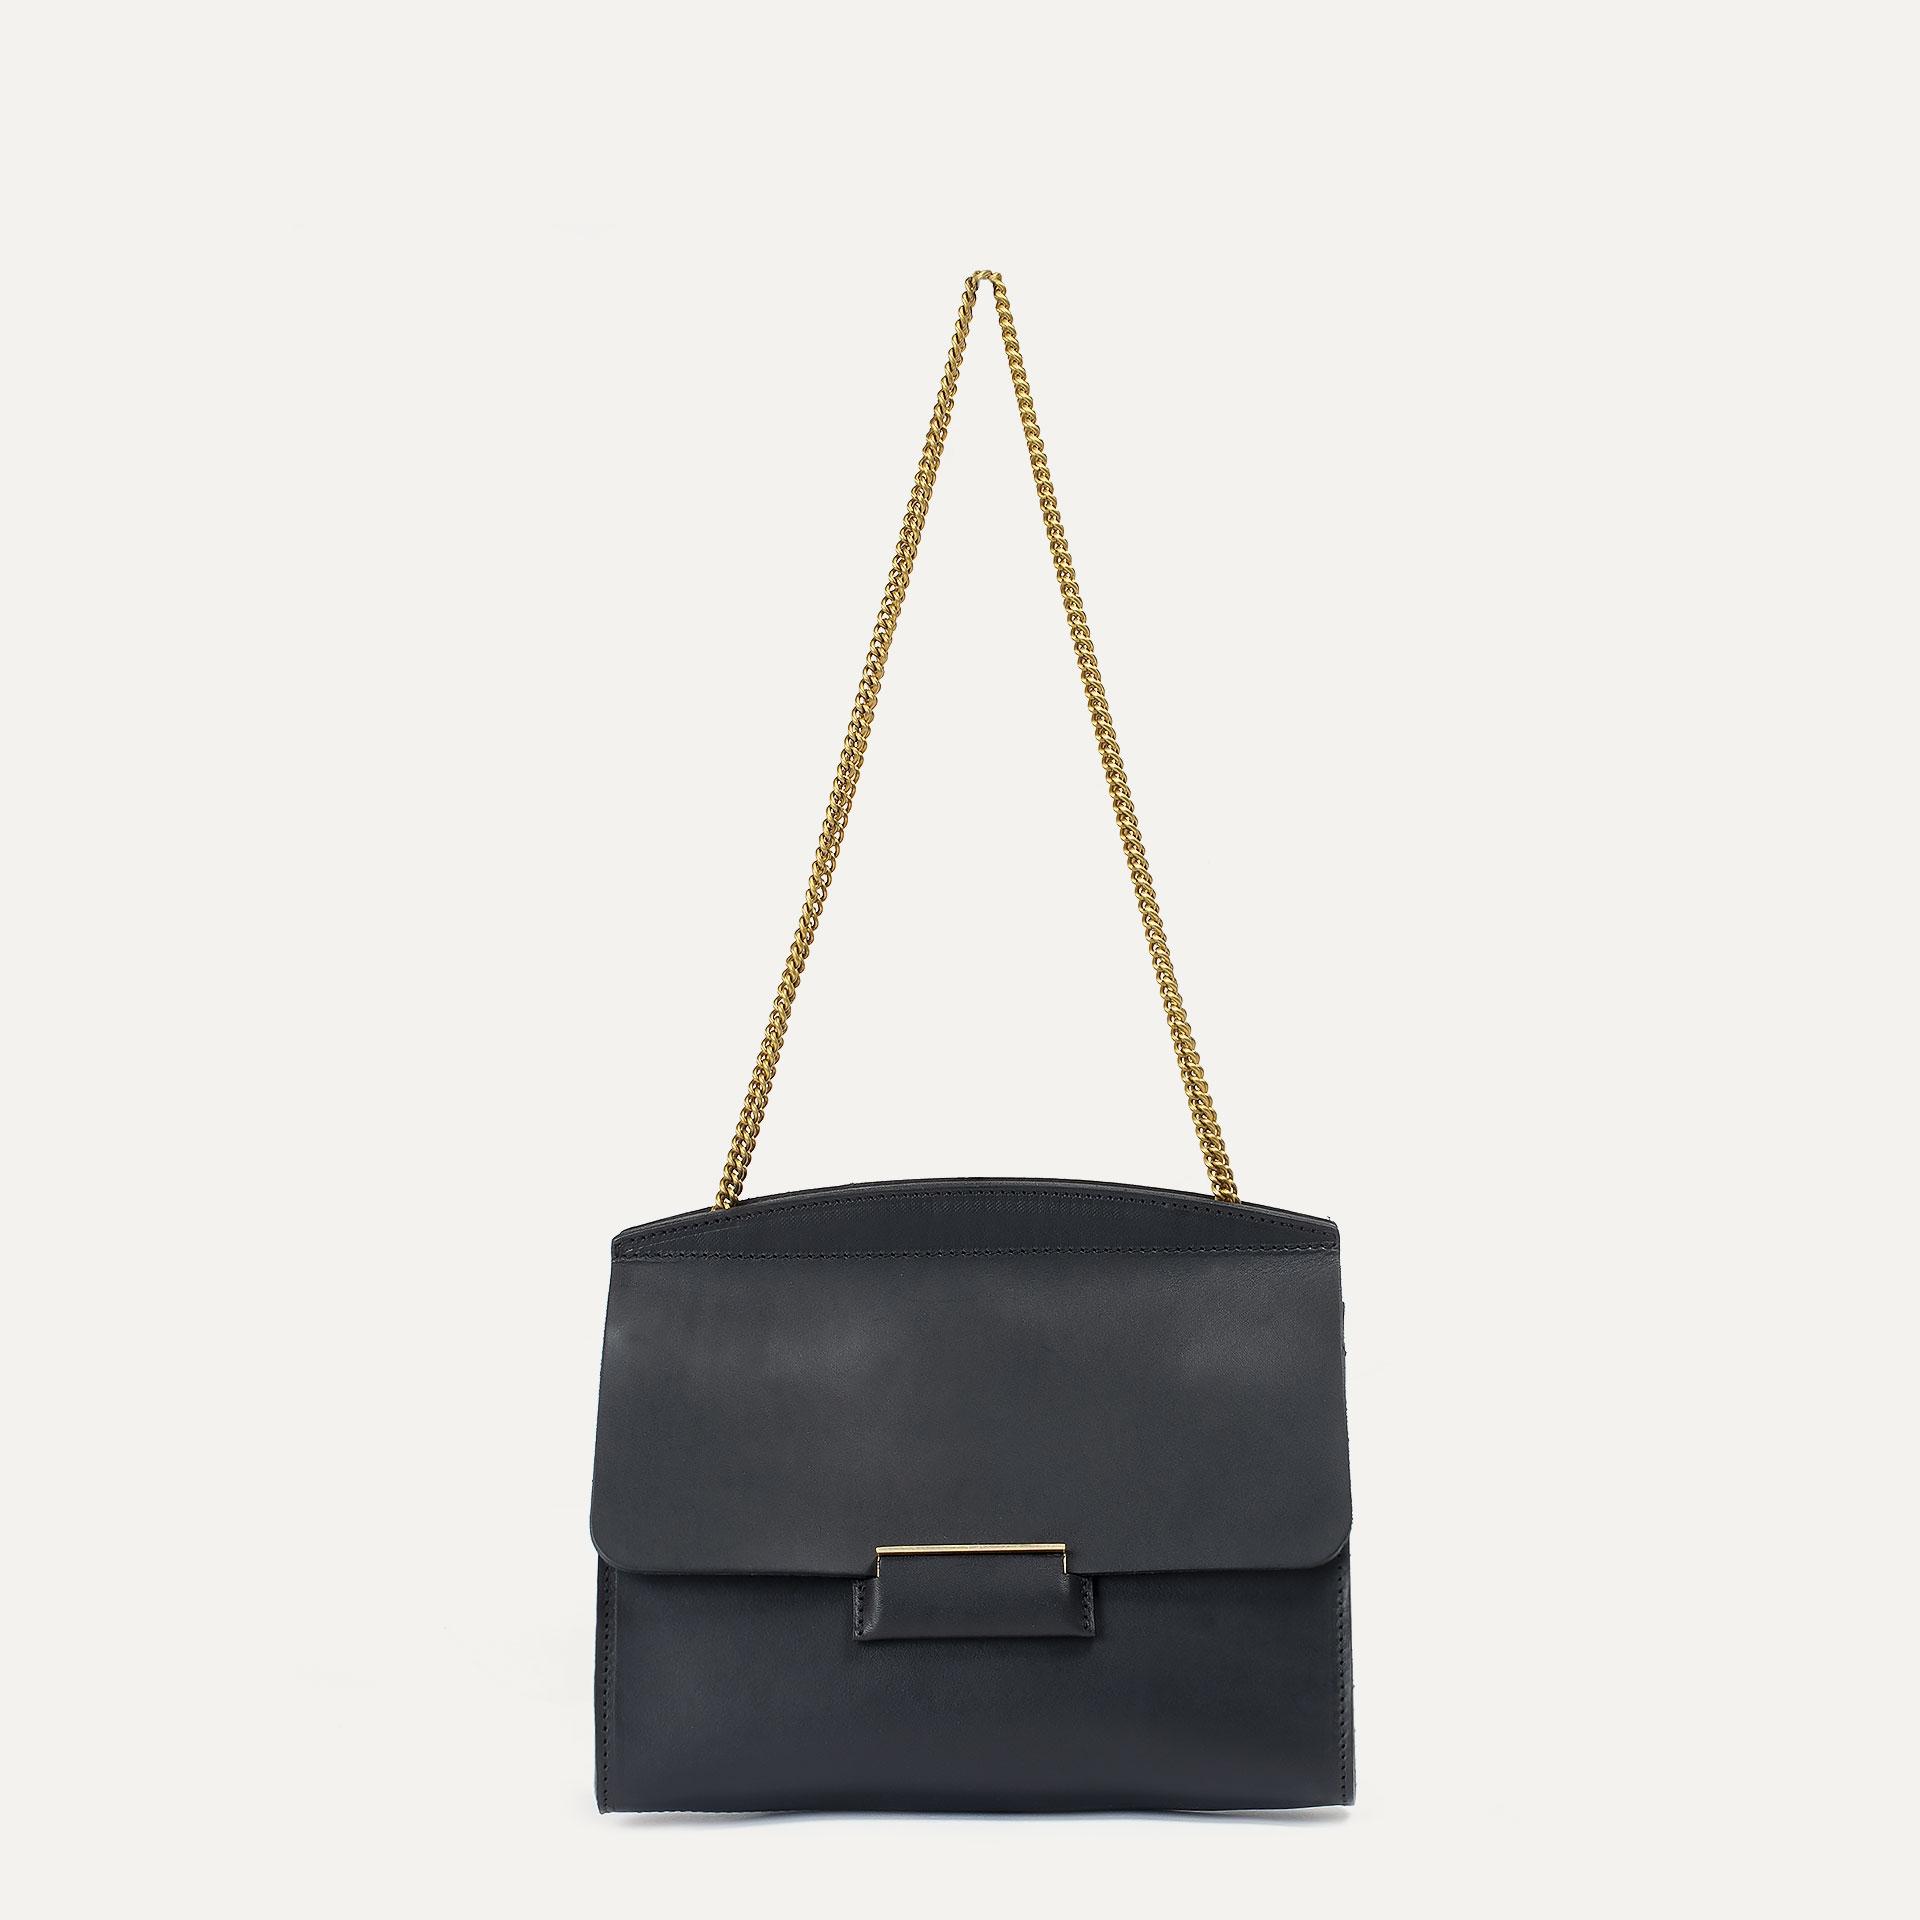 Origami S clutch bag - Black (image n°1)